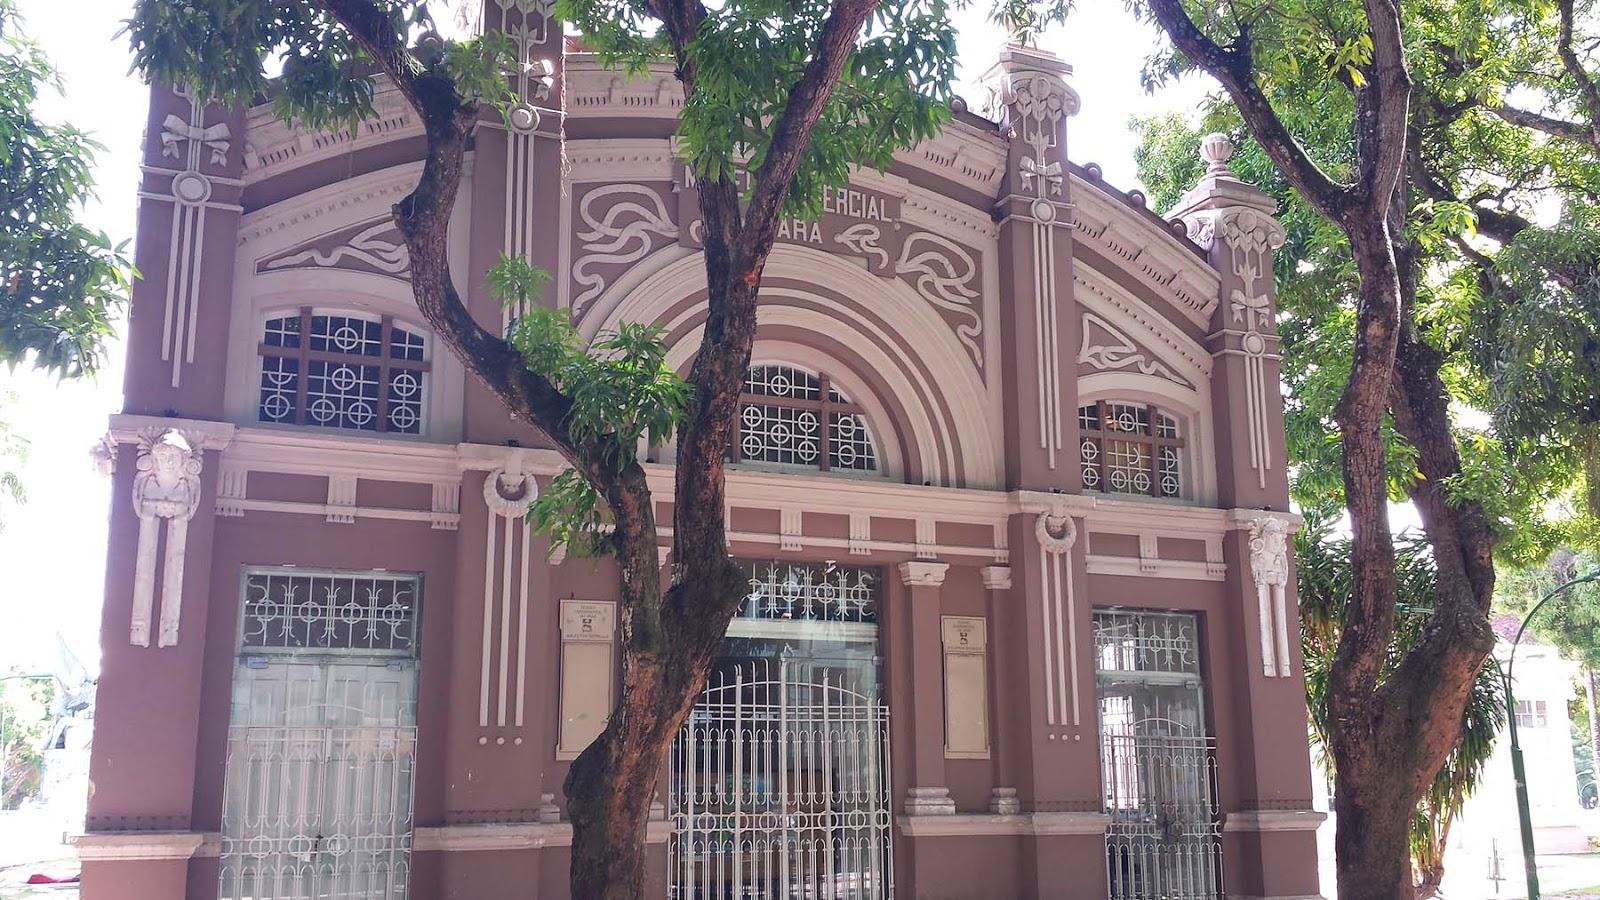 Teatro Experimental Waldemar Henrique, Belém do Pará